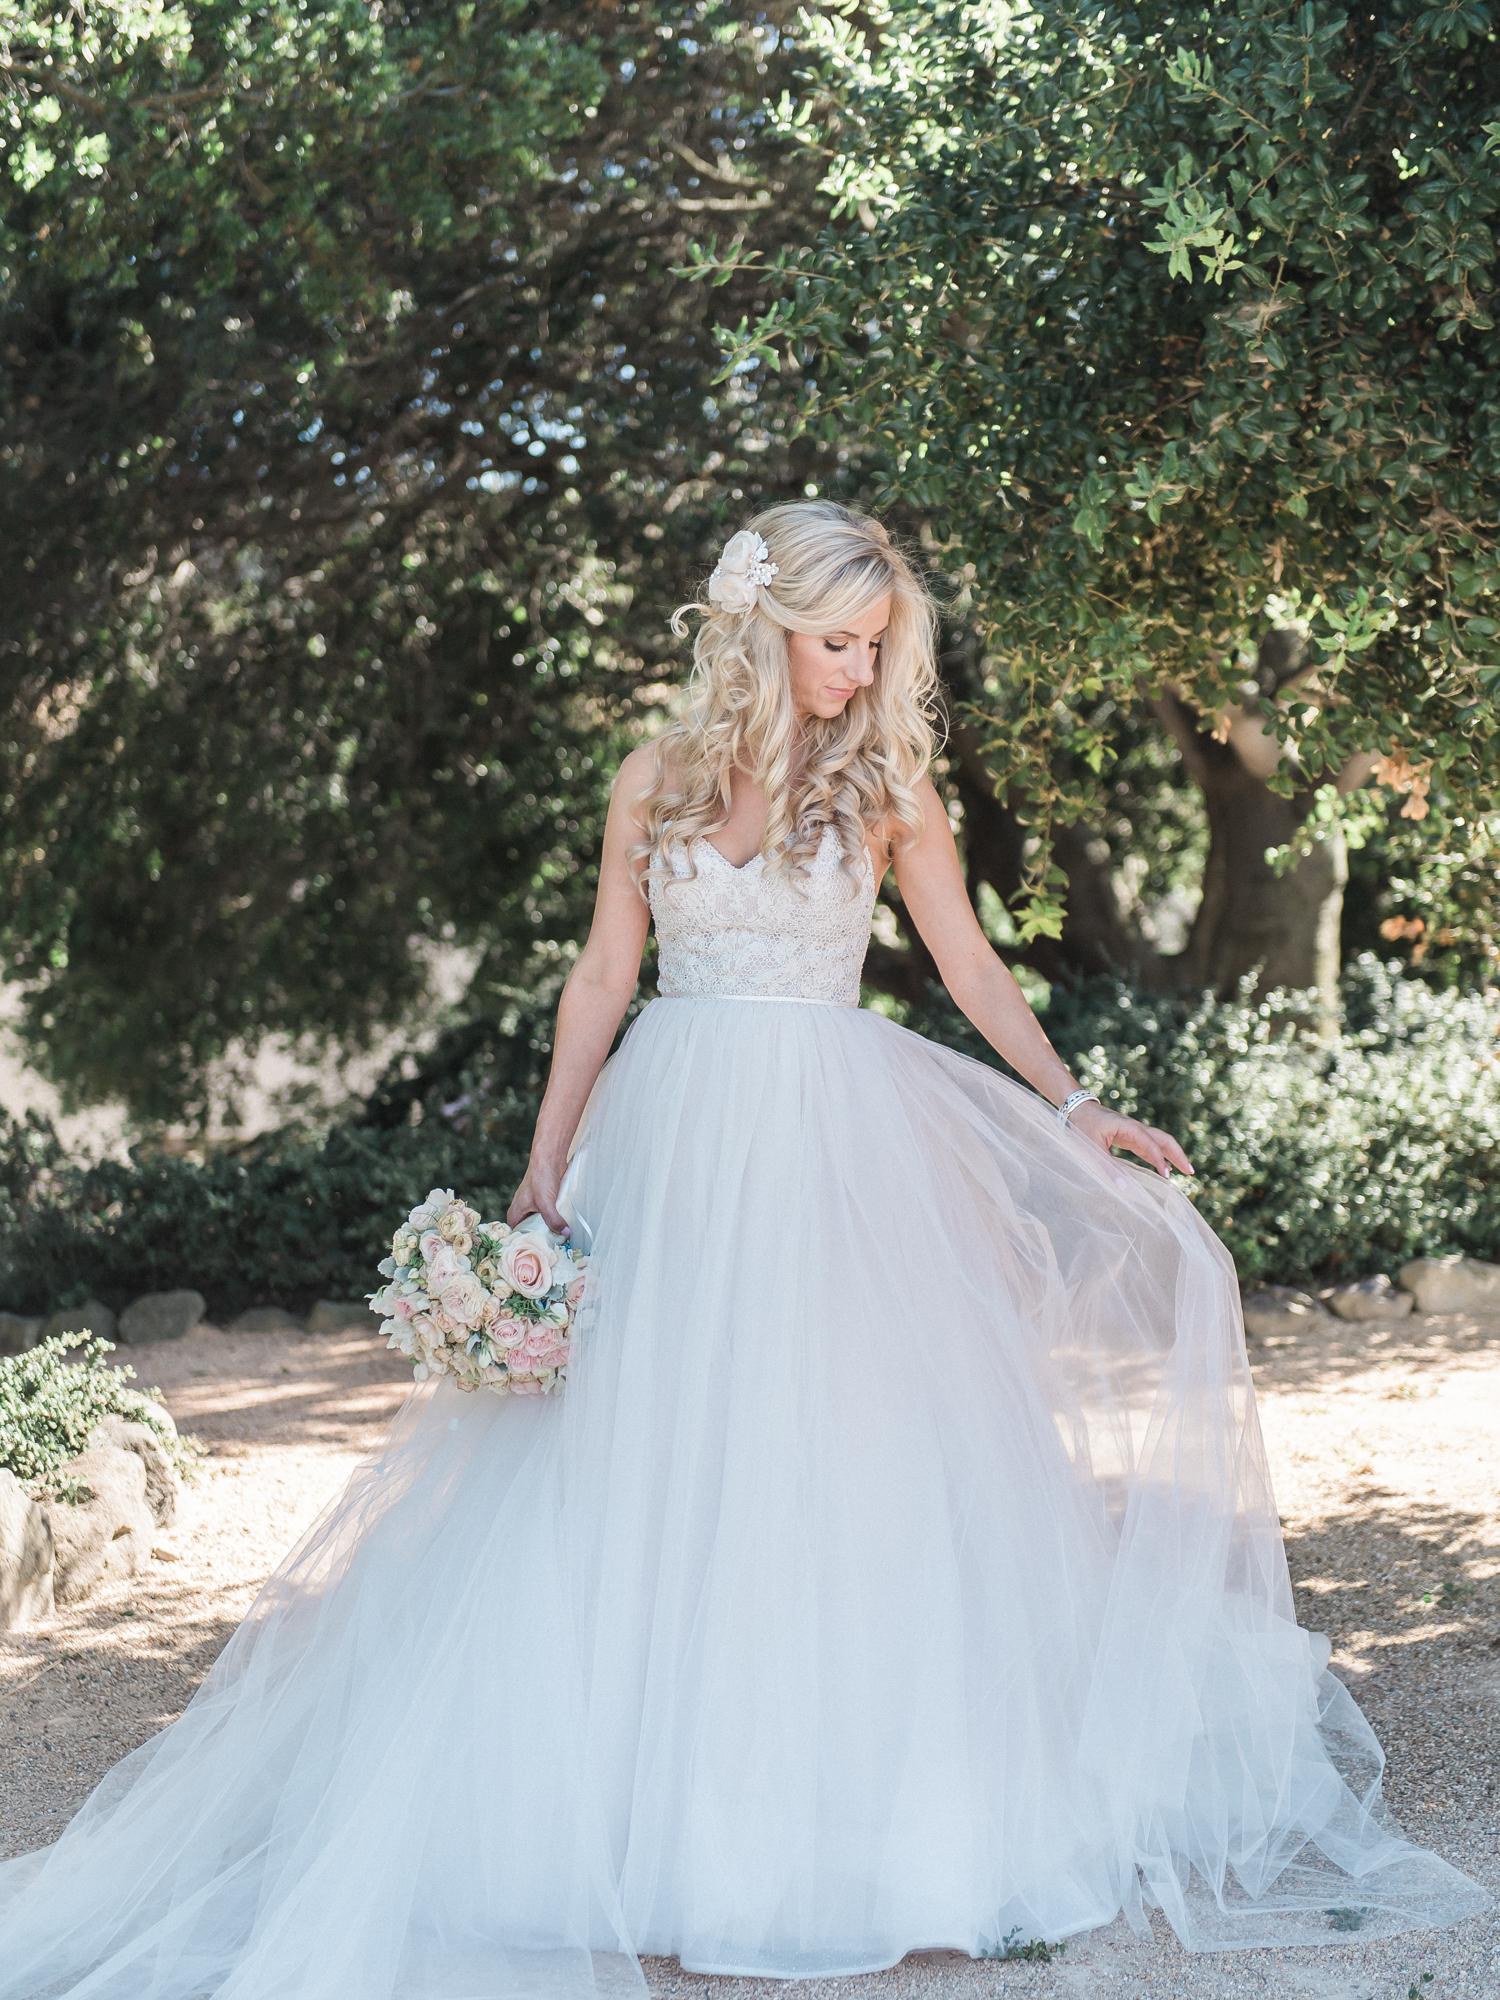 Aimee+Logan_wedding_spp-26.jpg